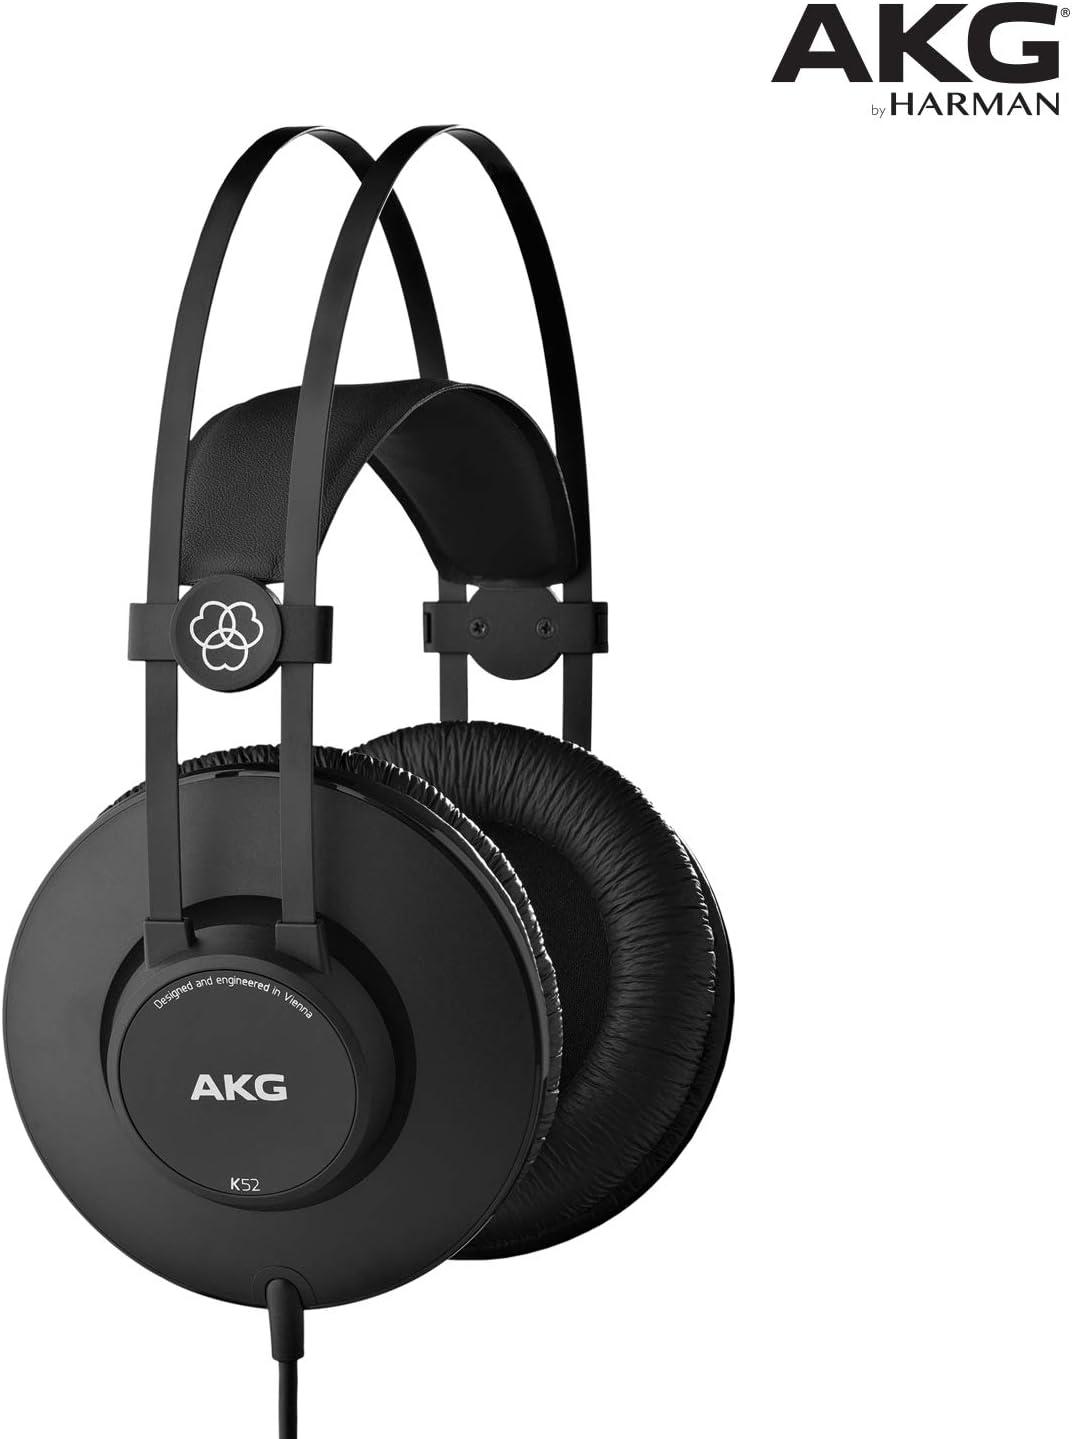 AKG K52 Circumaural